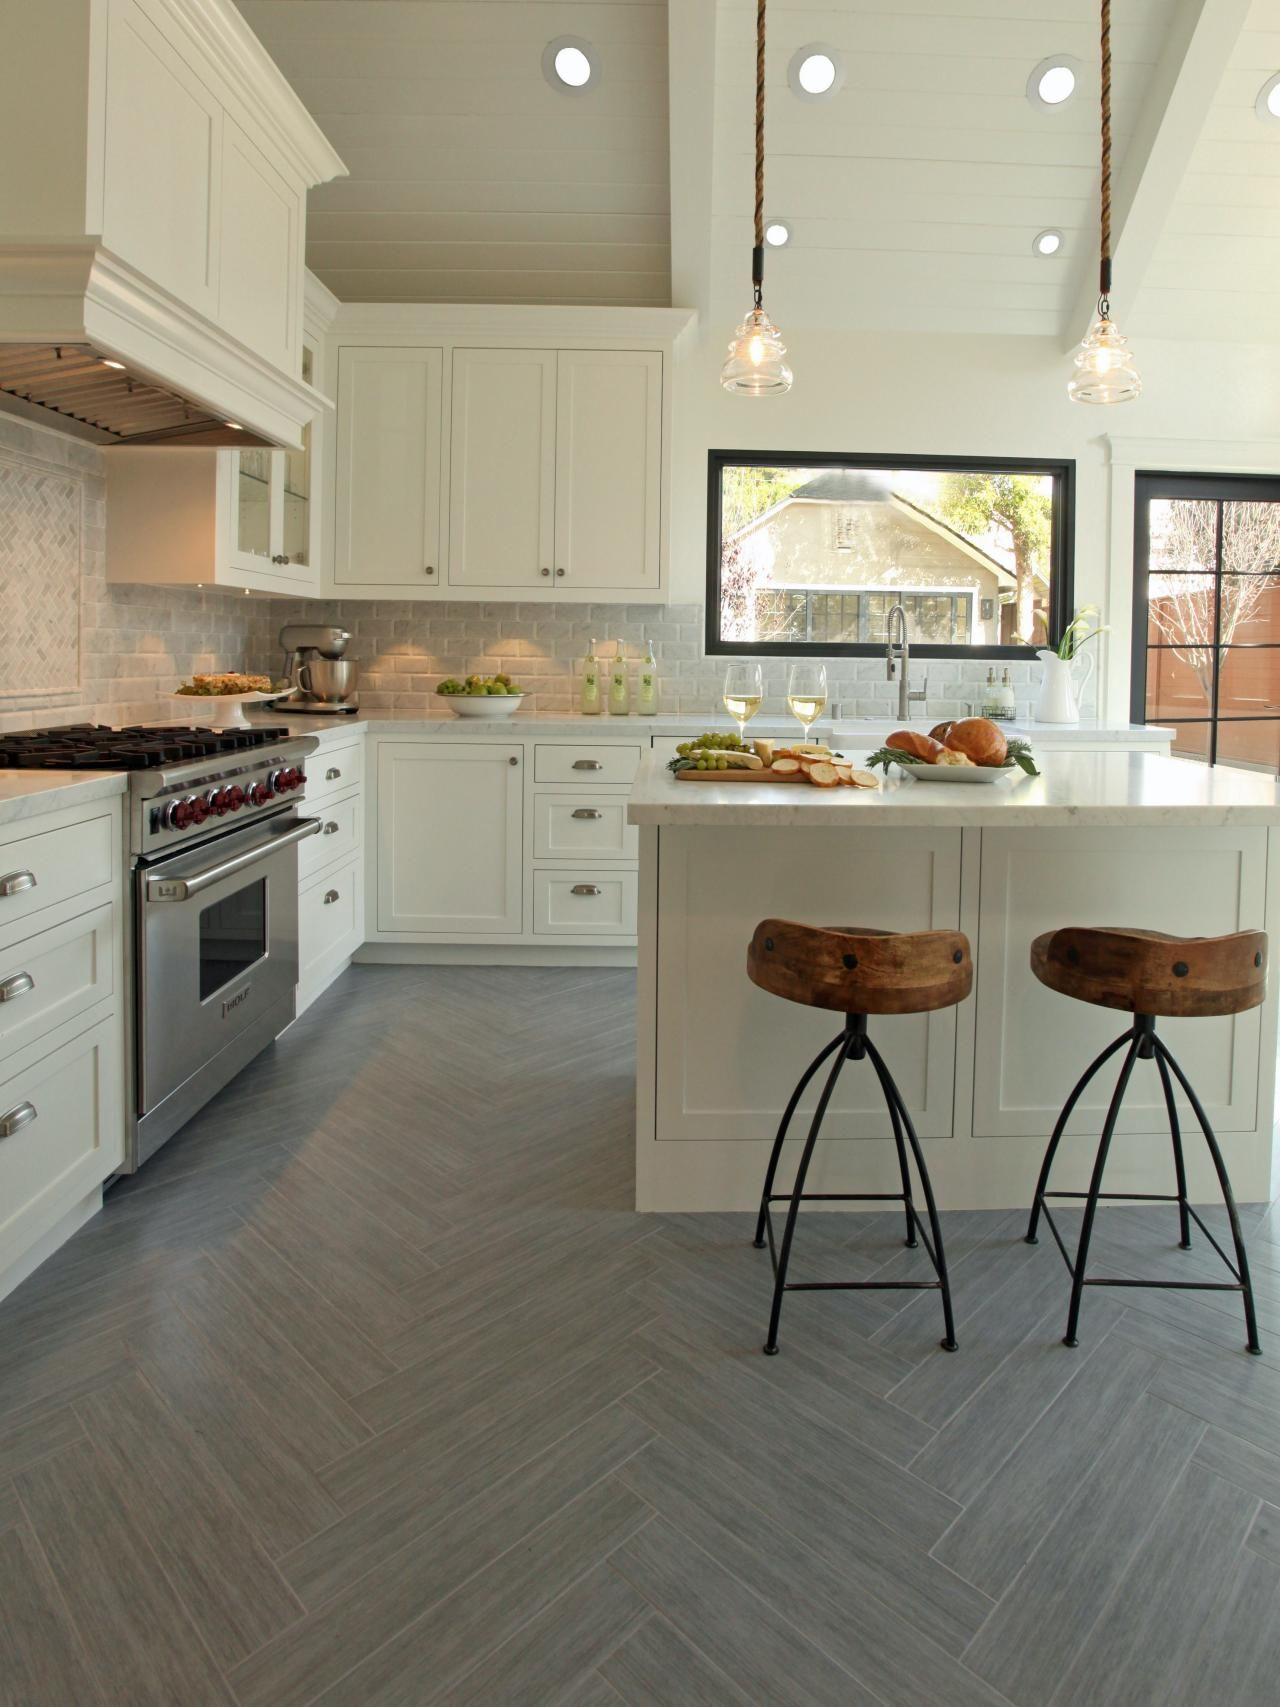 Our 55 Favorite White Kitchens | Hgtv, Herringbone pattern and ...